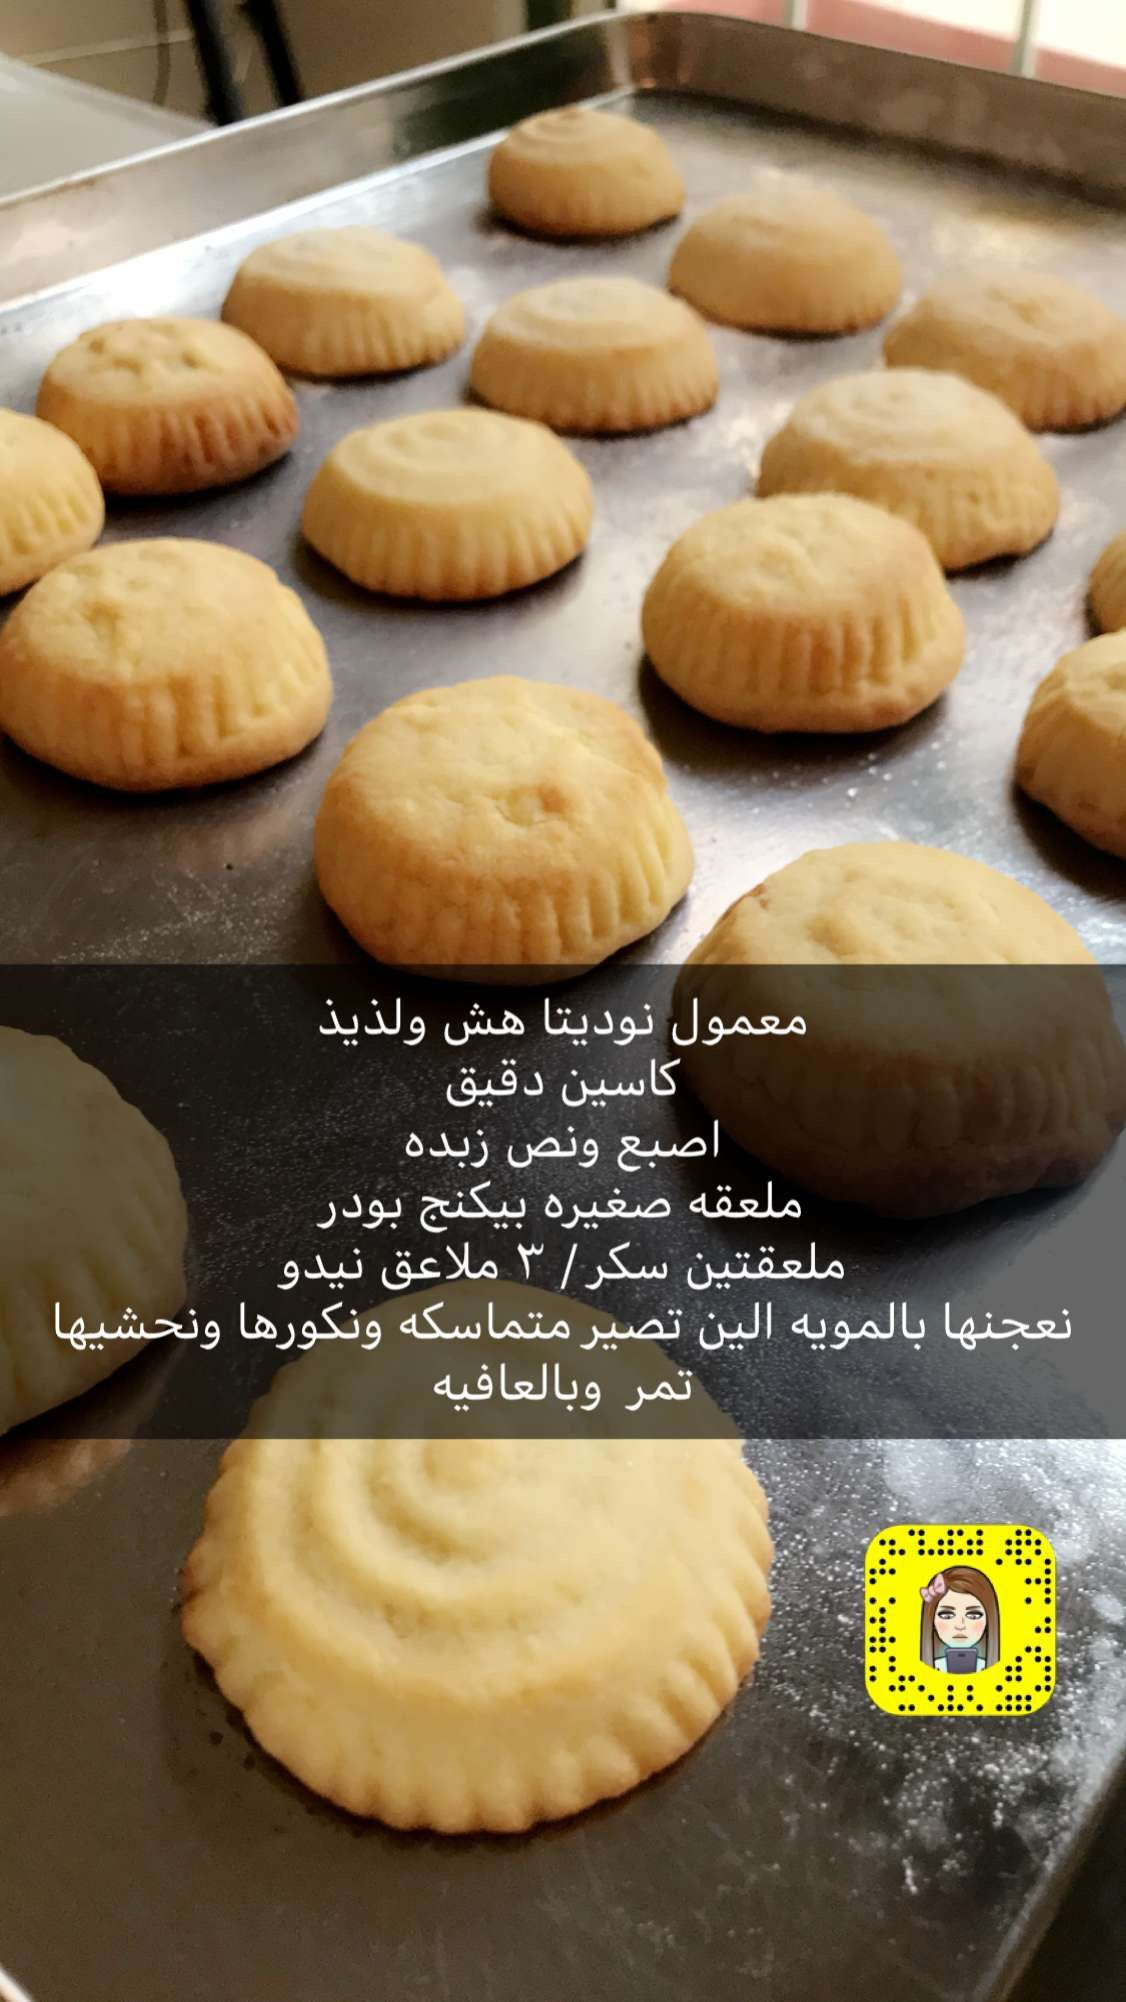 Pin By Lulu Ahmad On بسكويت وغريبه Cooking Recipes Desserts Yummy Food Dessert Arabic Food